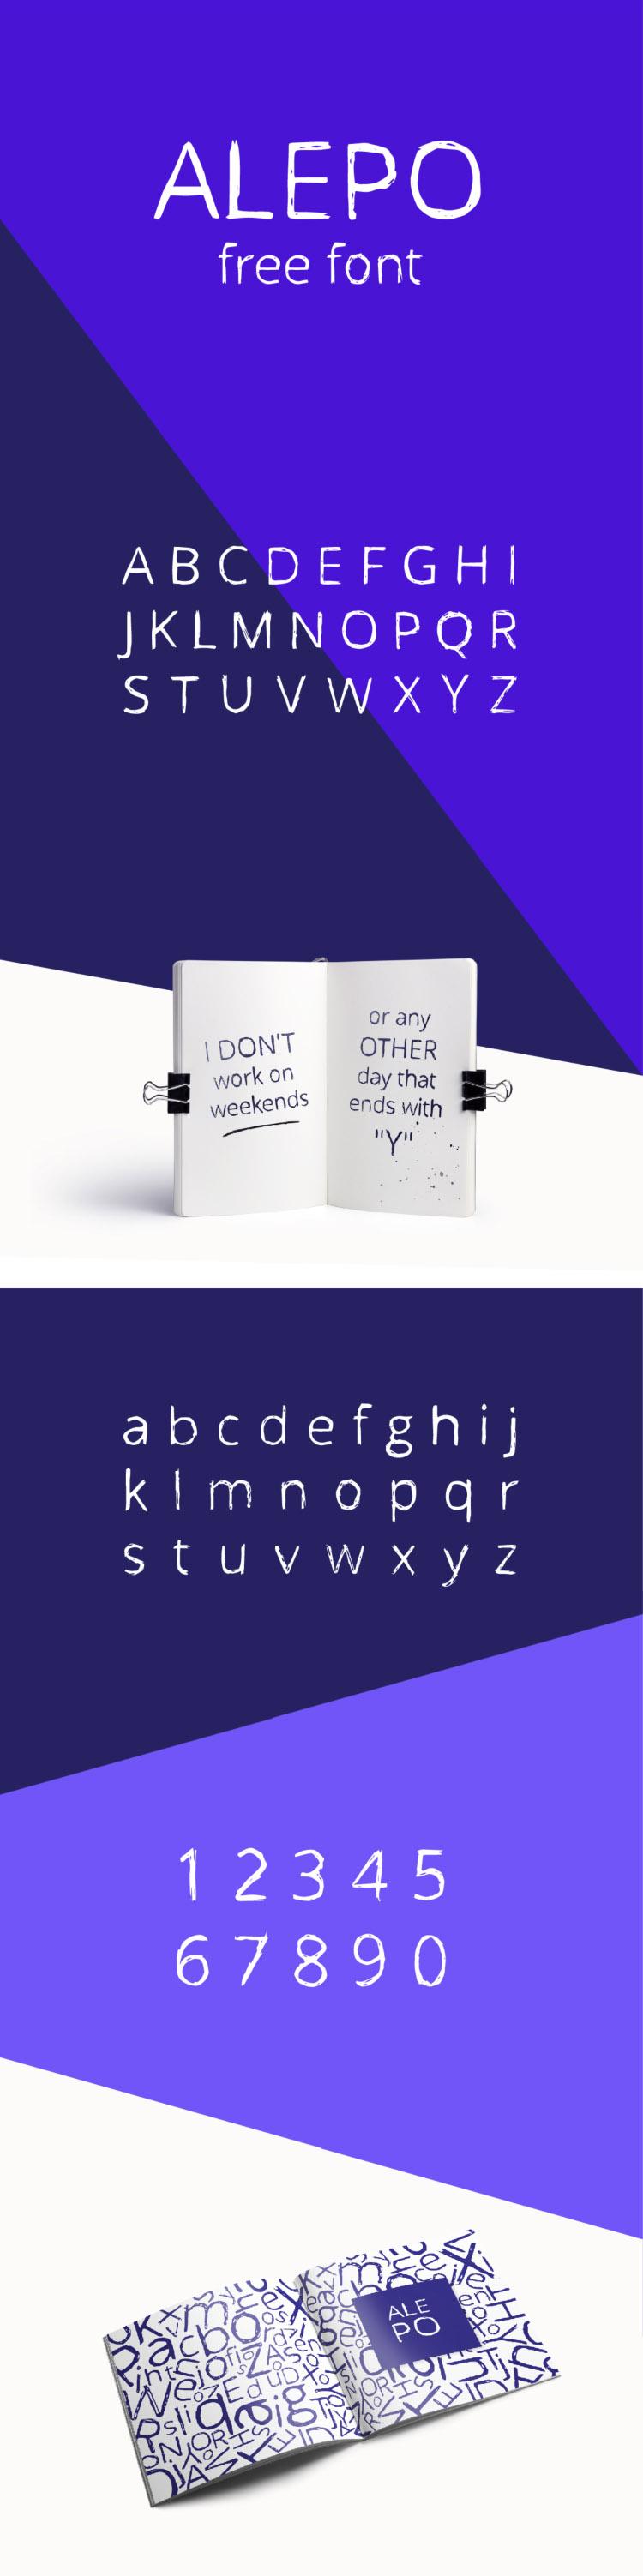 Alepo Font - WILDTYPE